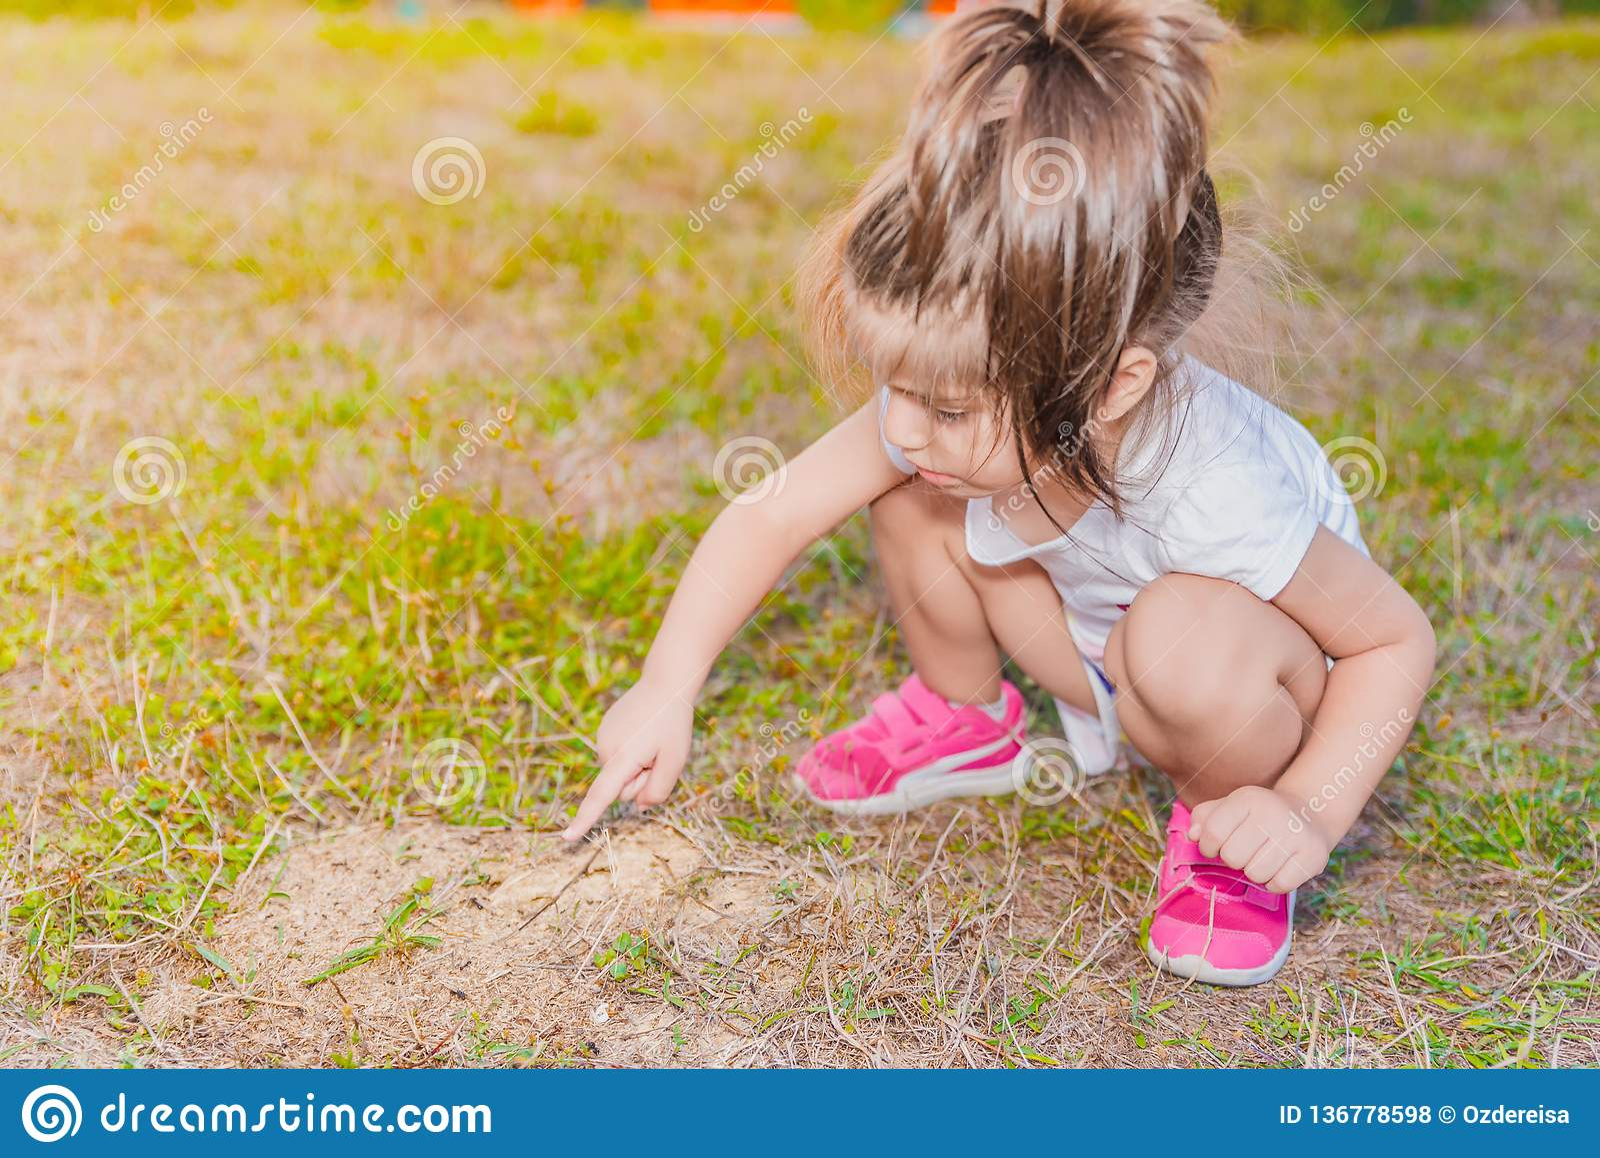 Meisje wat betreft kleine mieren met haar vinger op mier hil